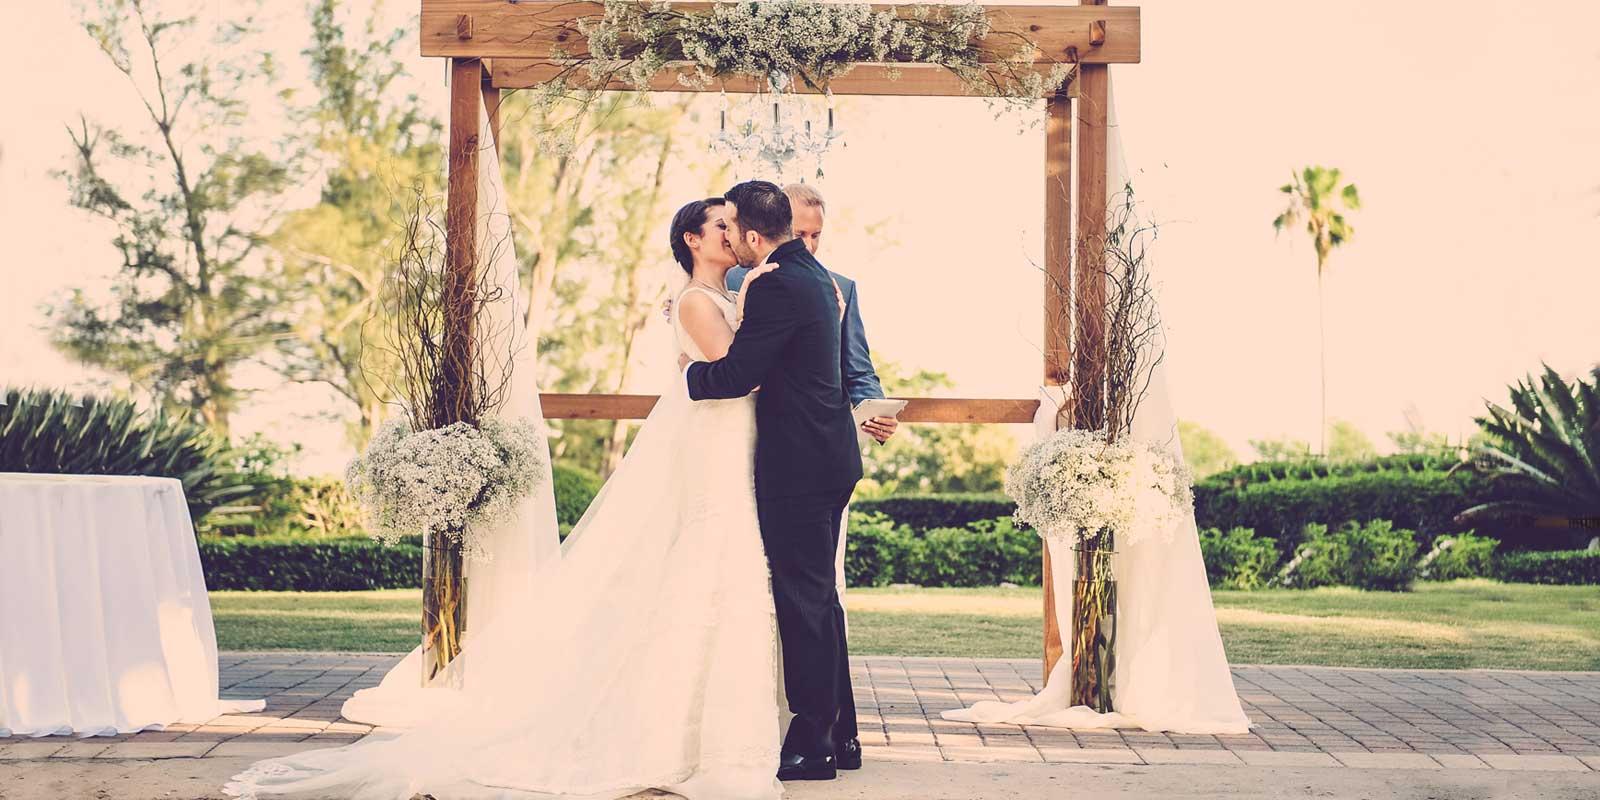 A couple enjoy their Biltmore wedding ceremony